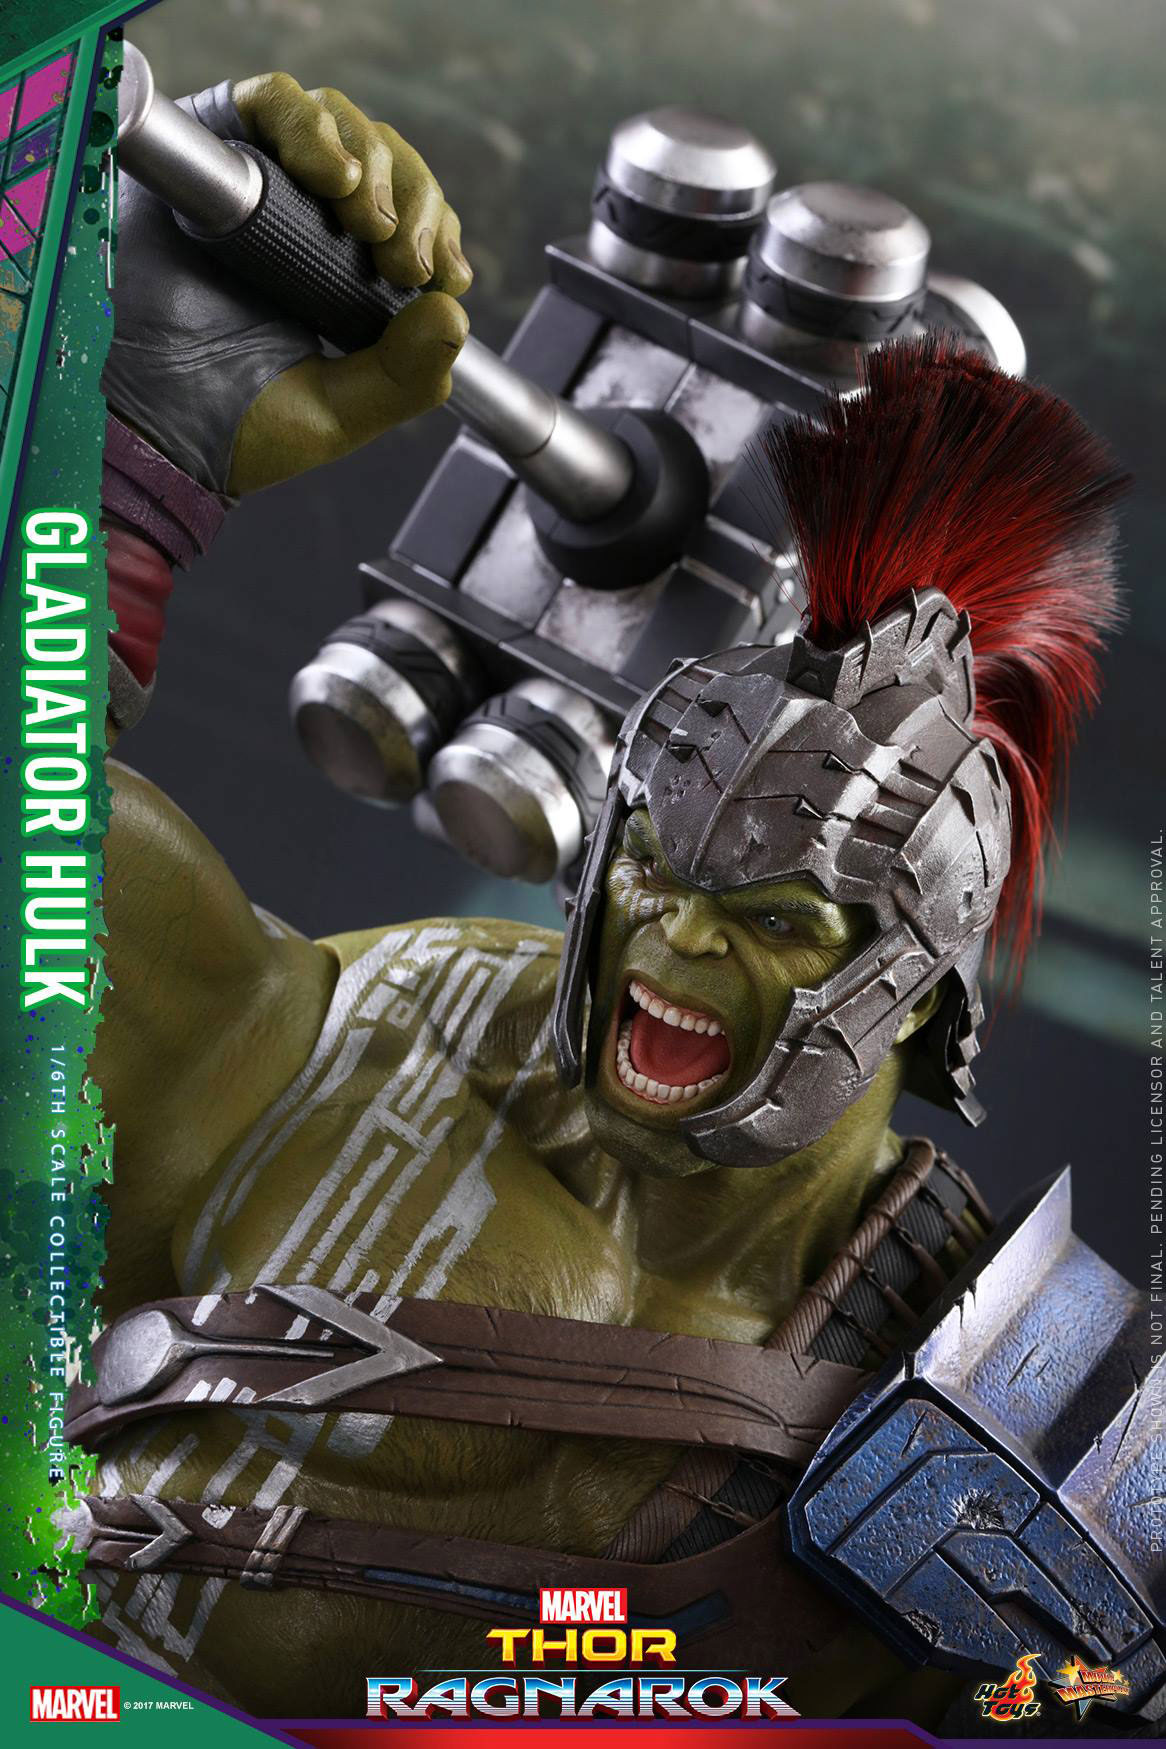 thor-ragnarok-gladiator-hulk-hot-toys-figure-8